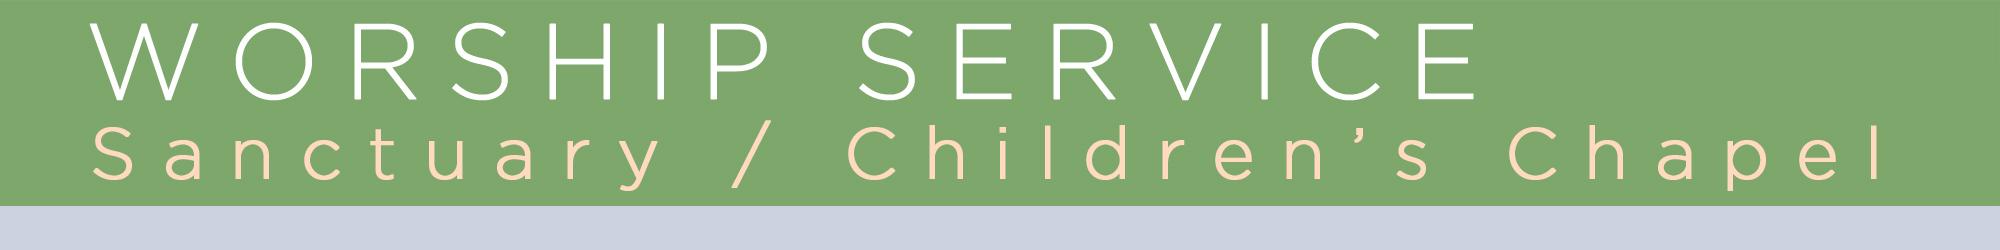 Worship - Children's Chapel REV FEB 2019.jpg